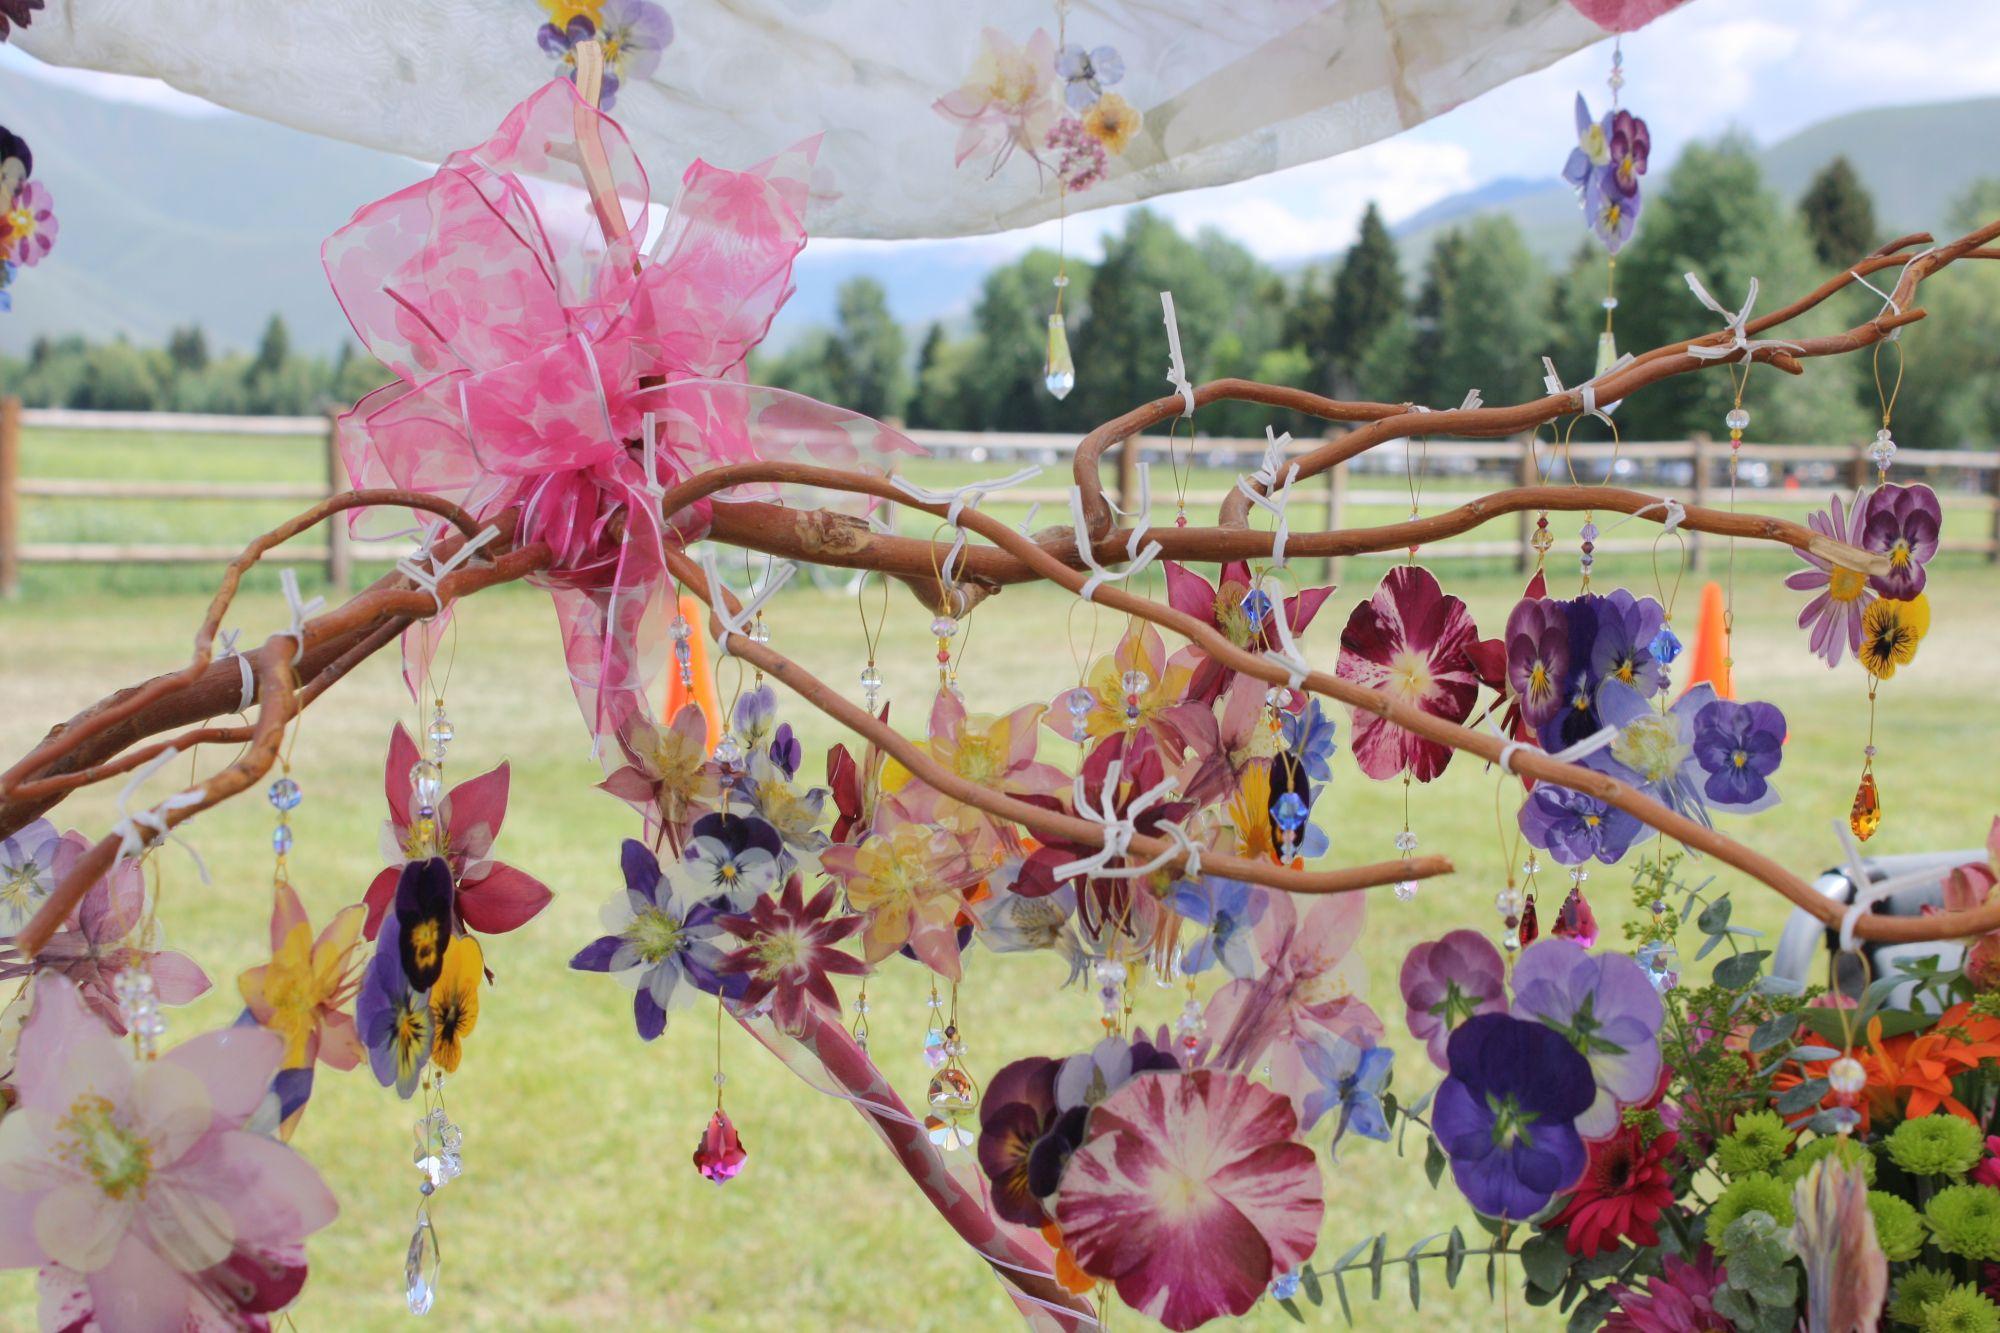 Ketchum Arts Festival @ Festival Meadows